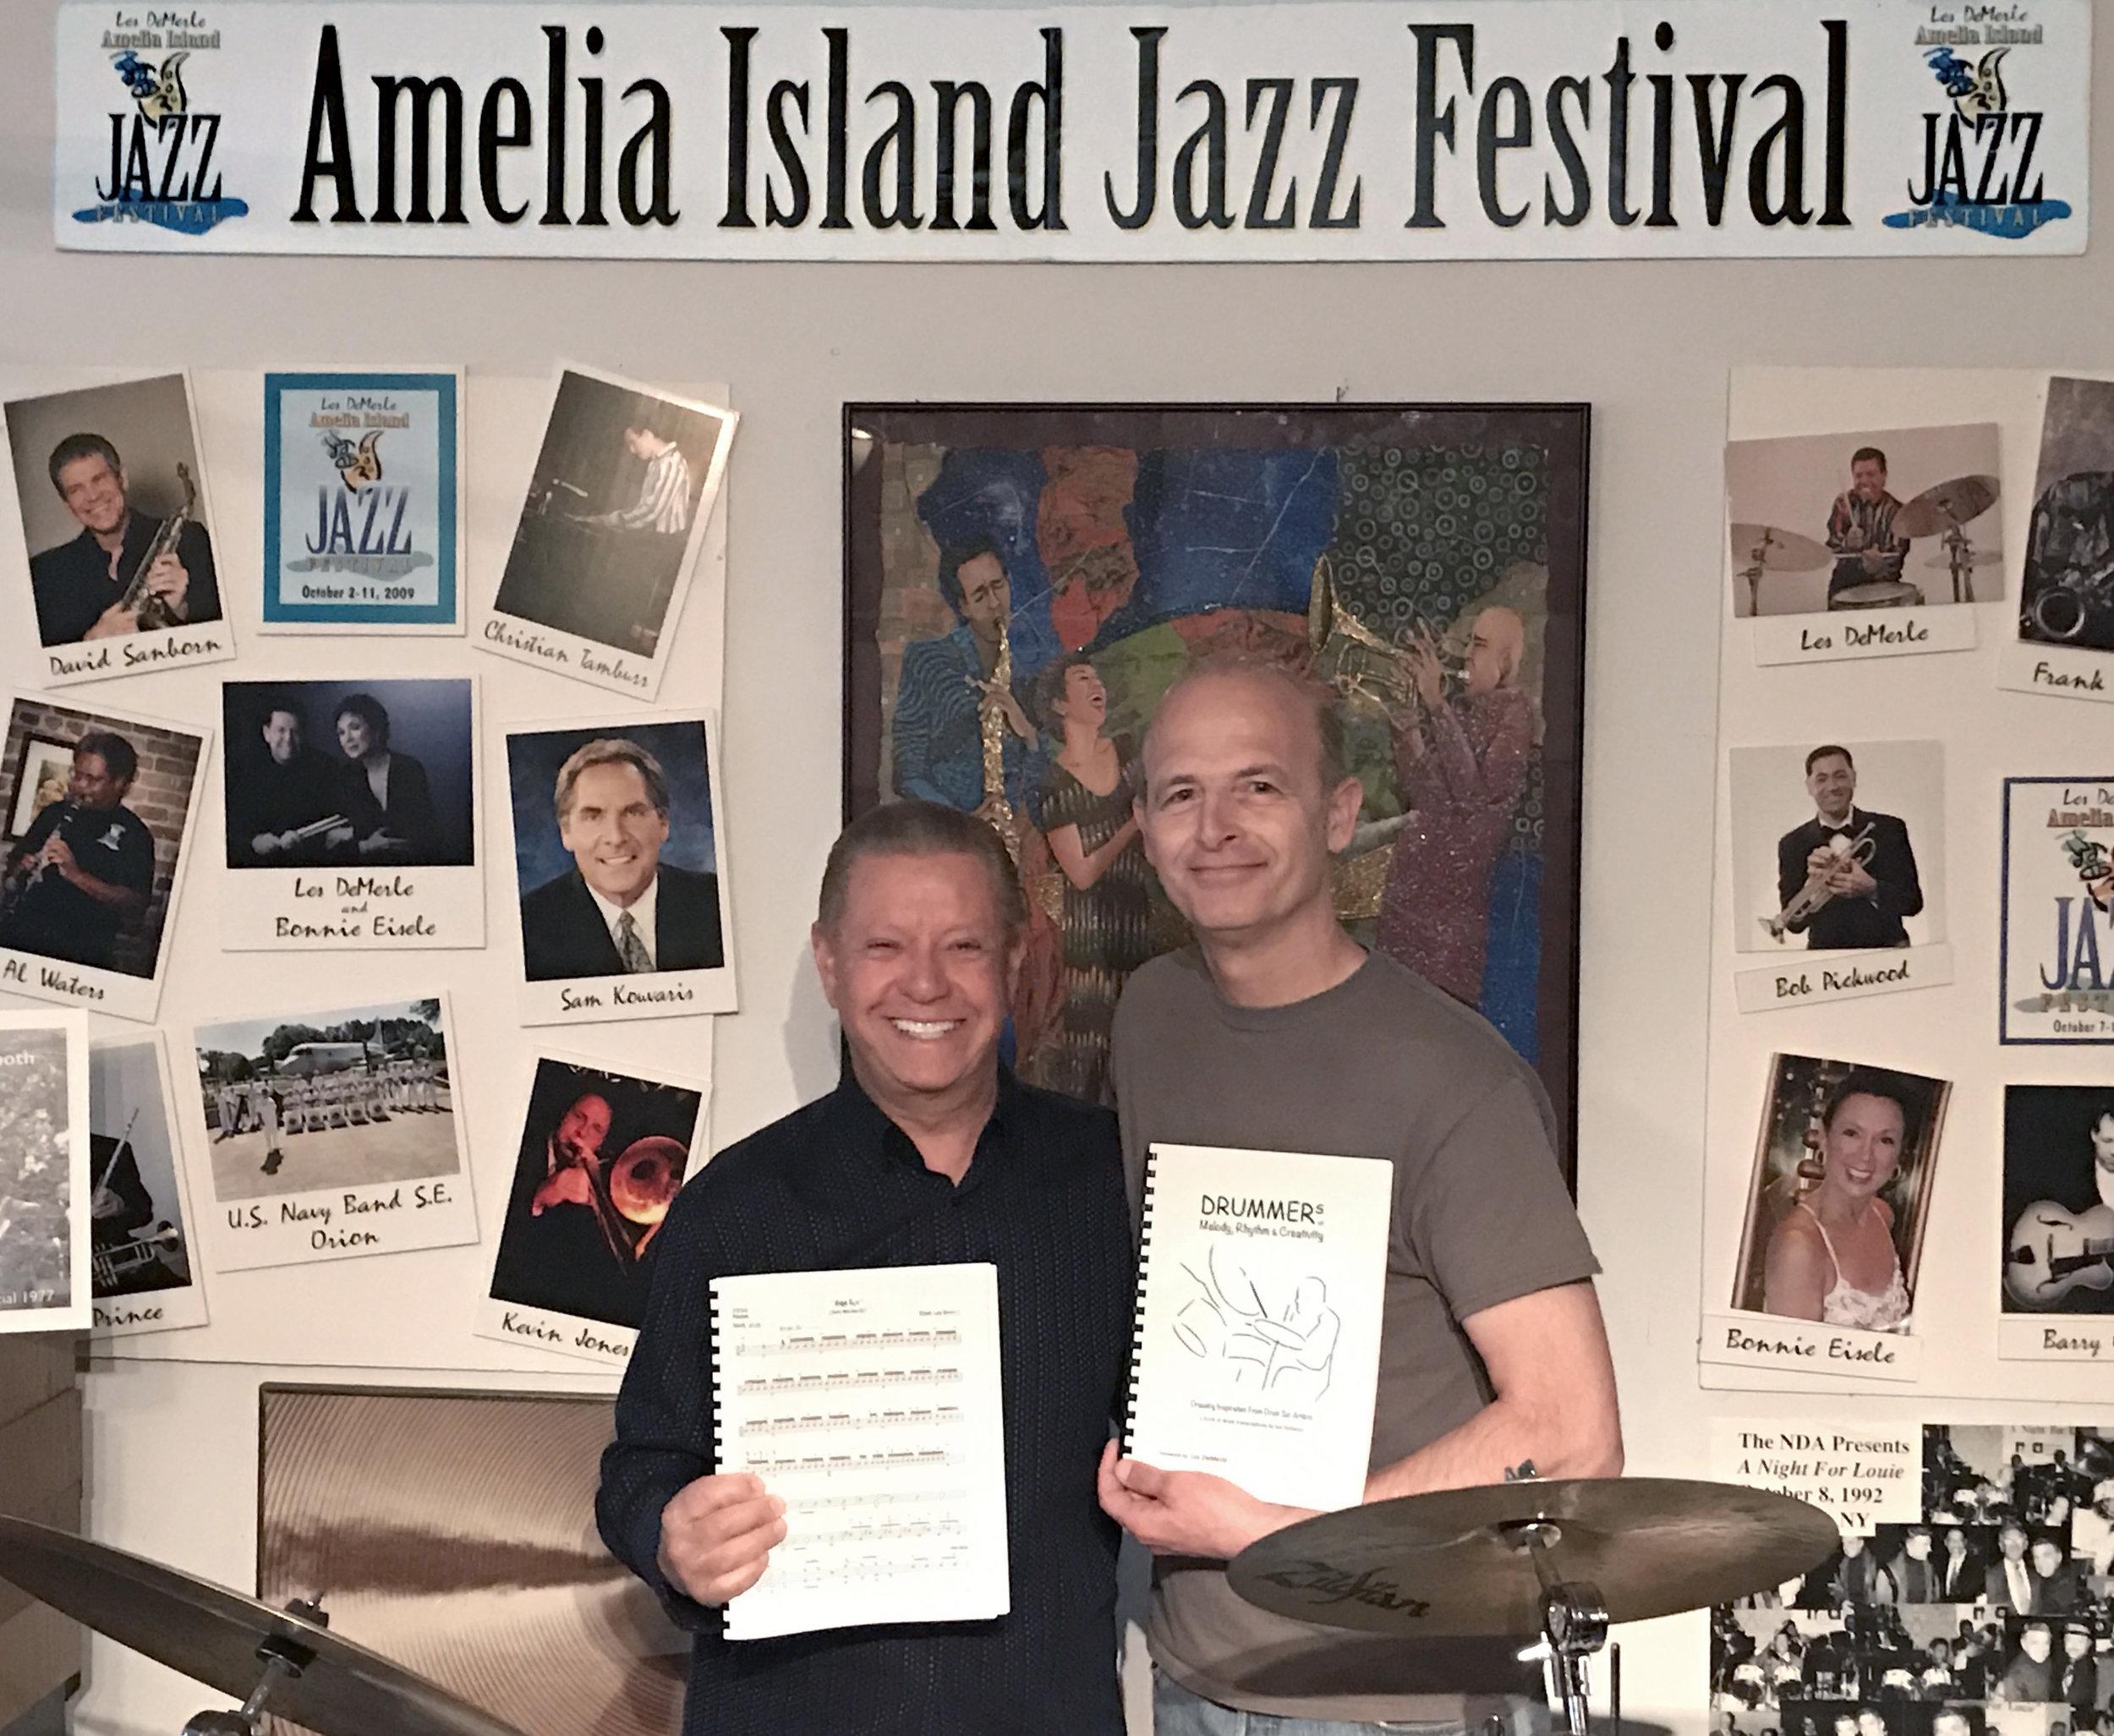 Les DeMerle Amelia Island Drum Studio